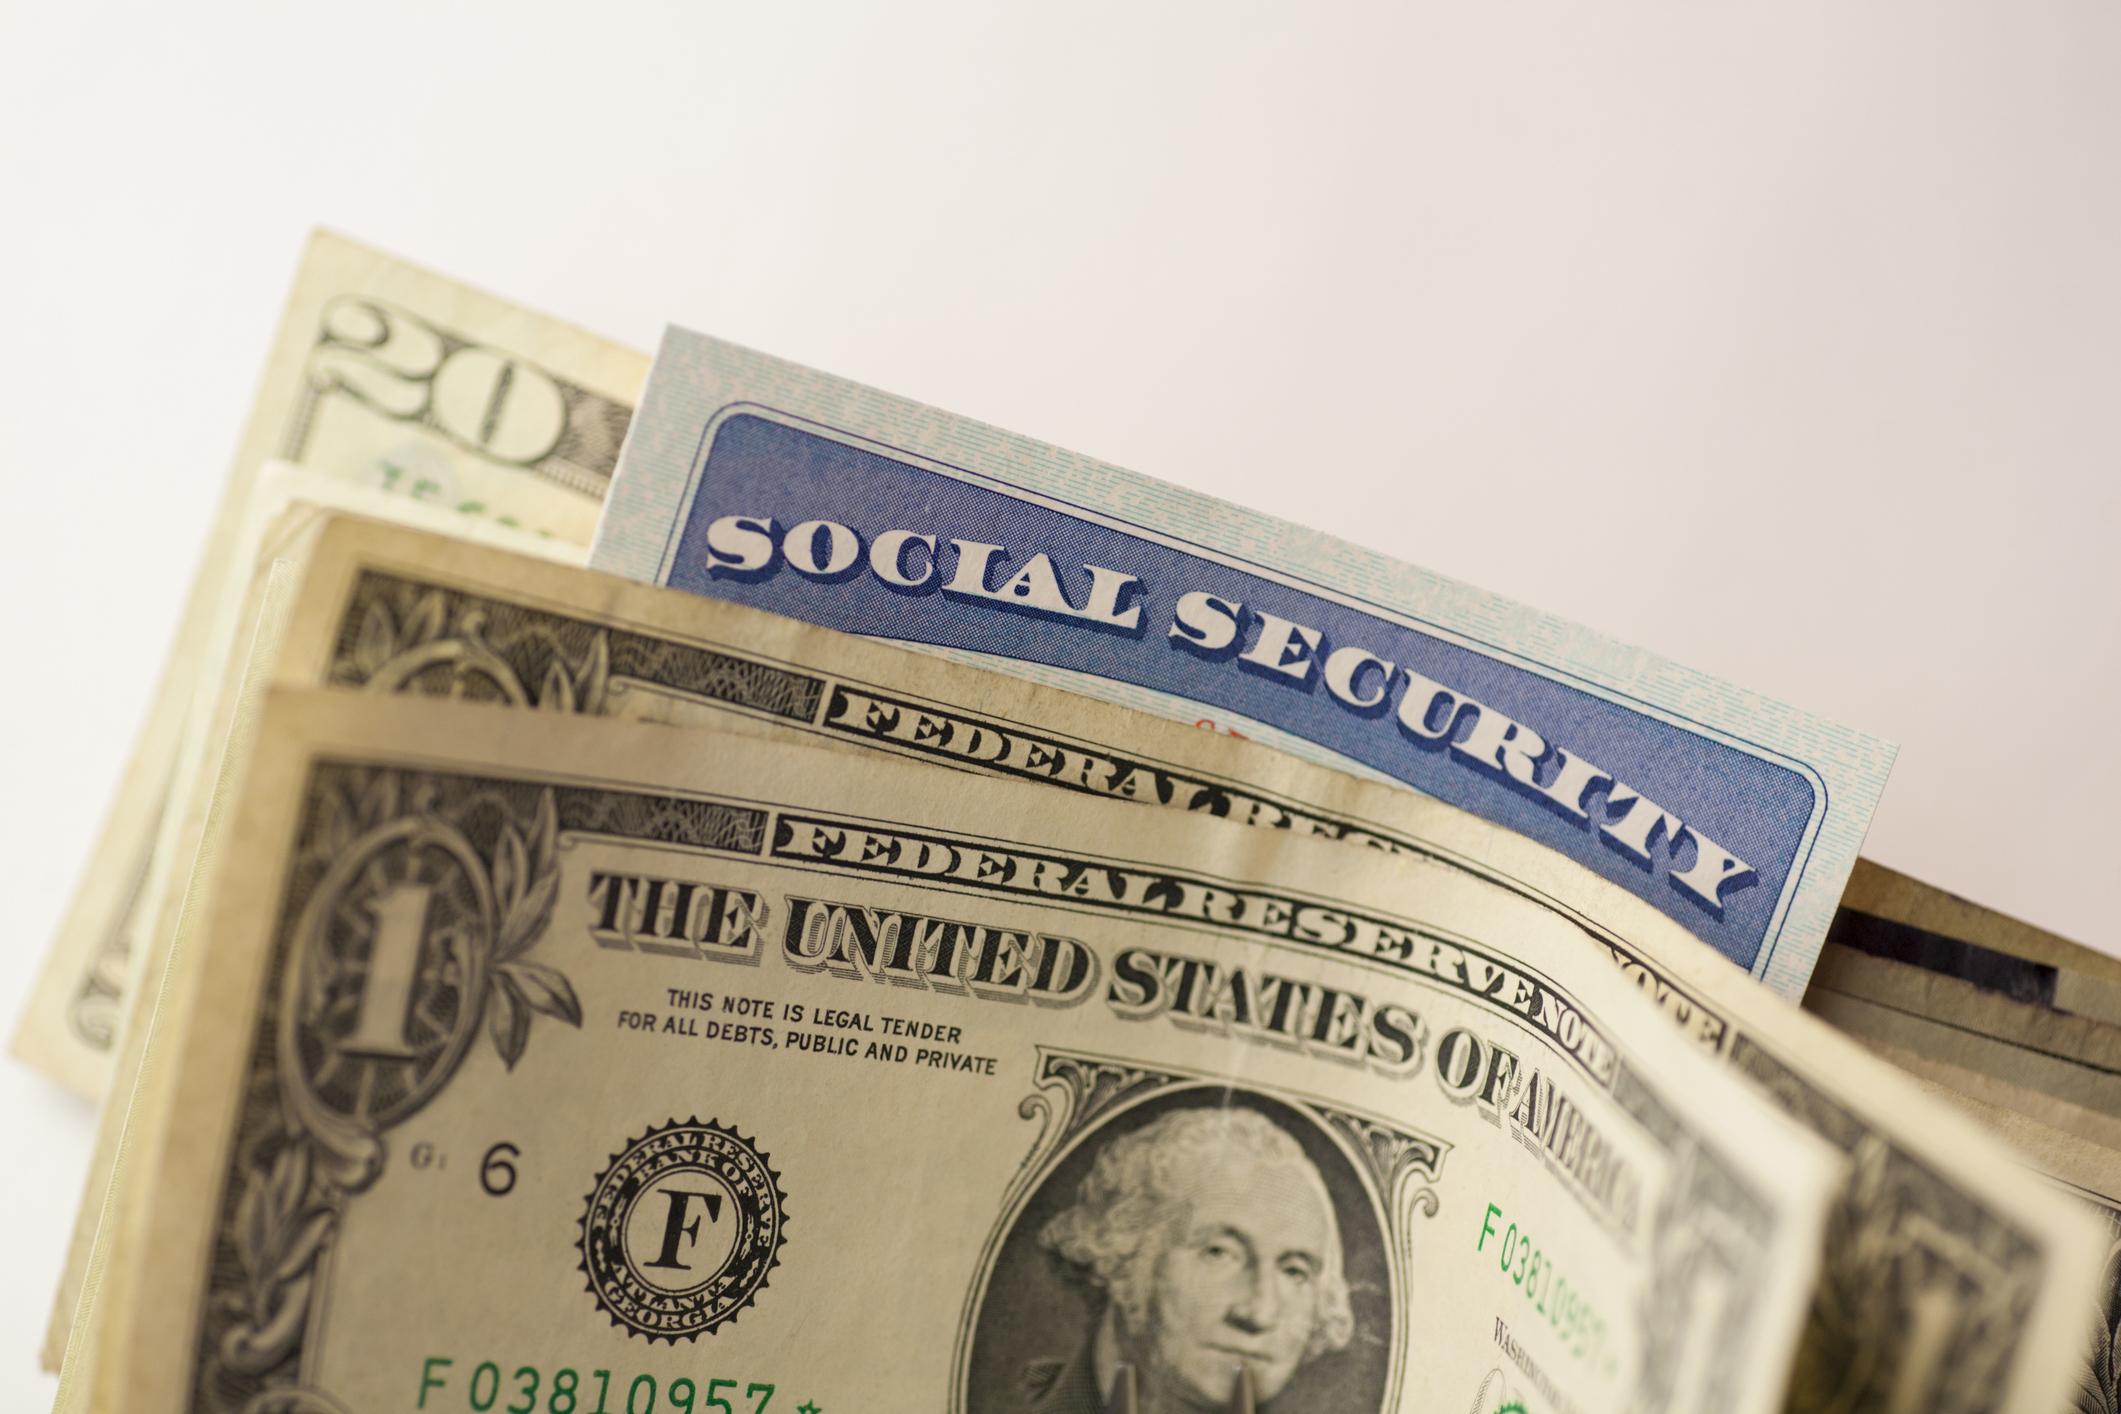 A Social Security card wedged in between cash bills.